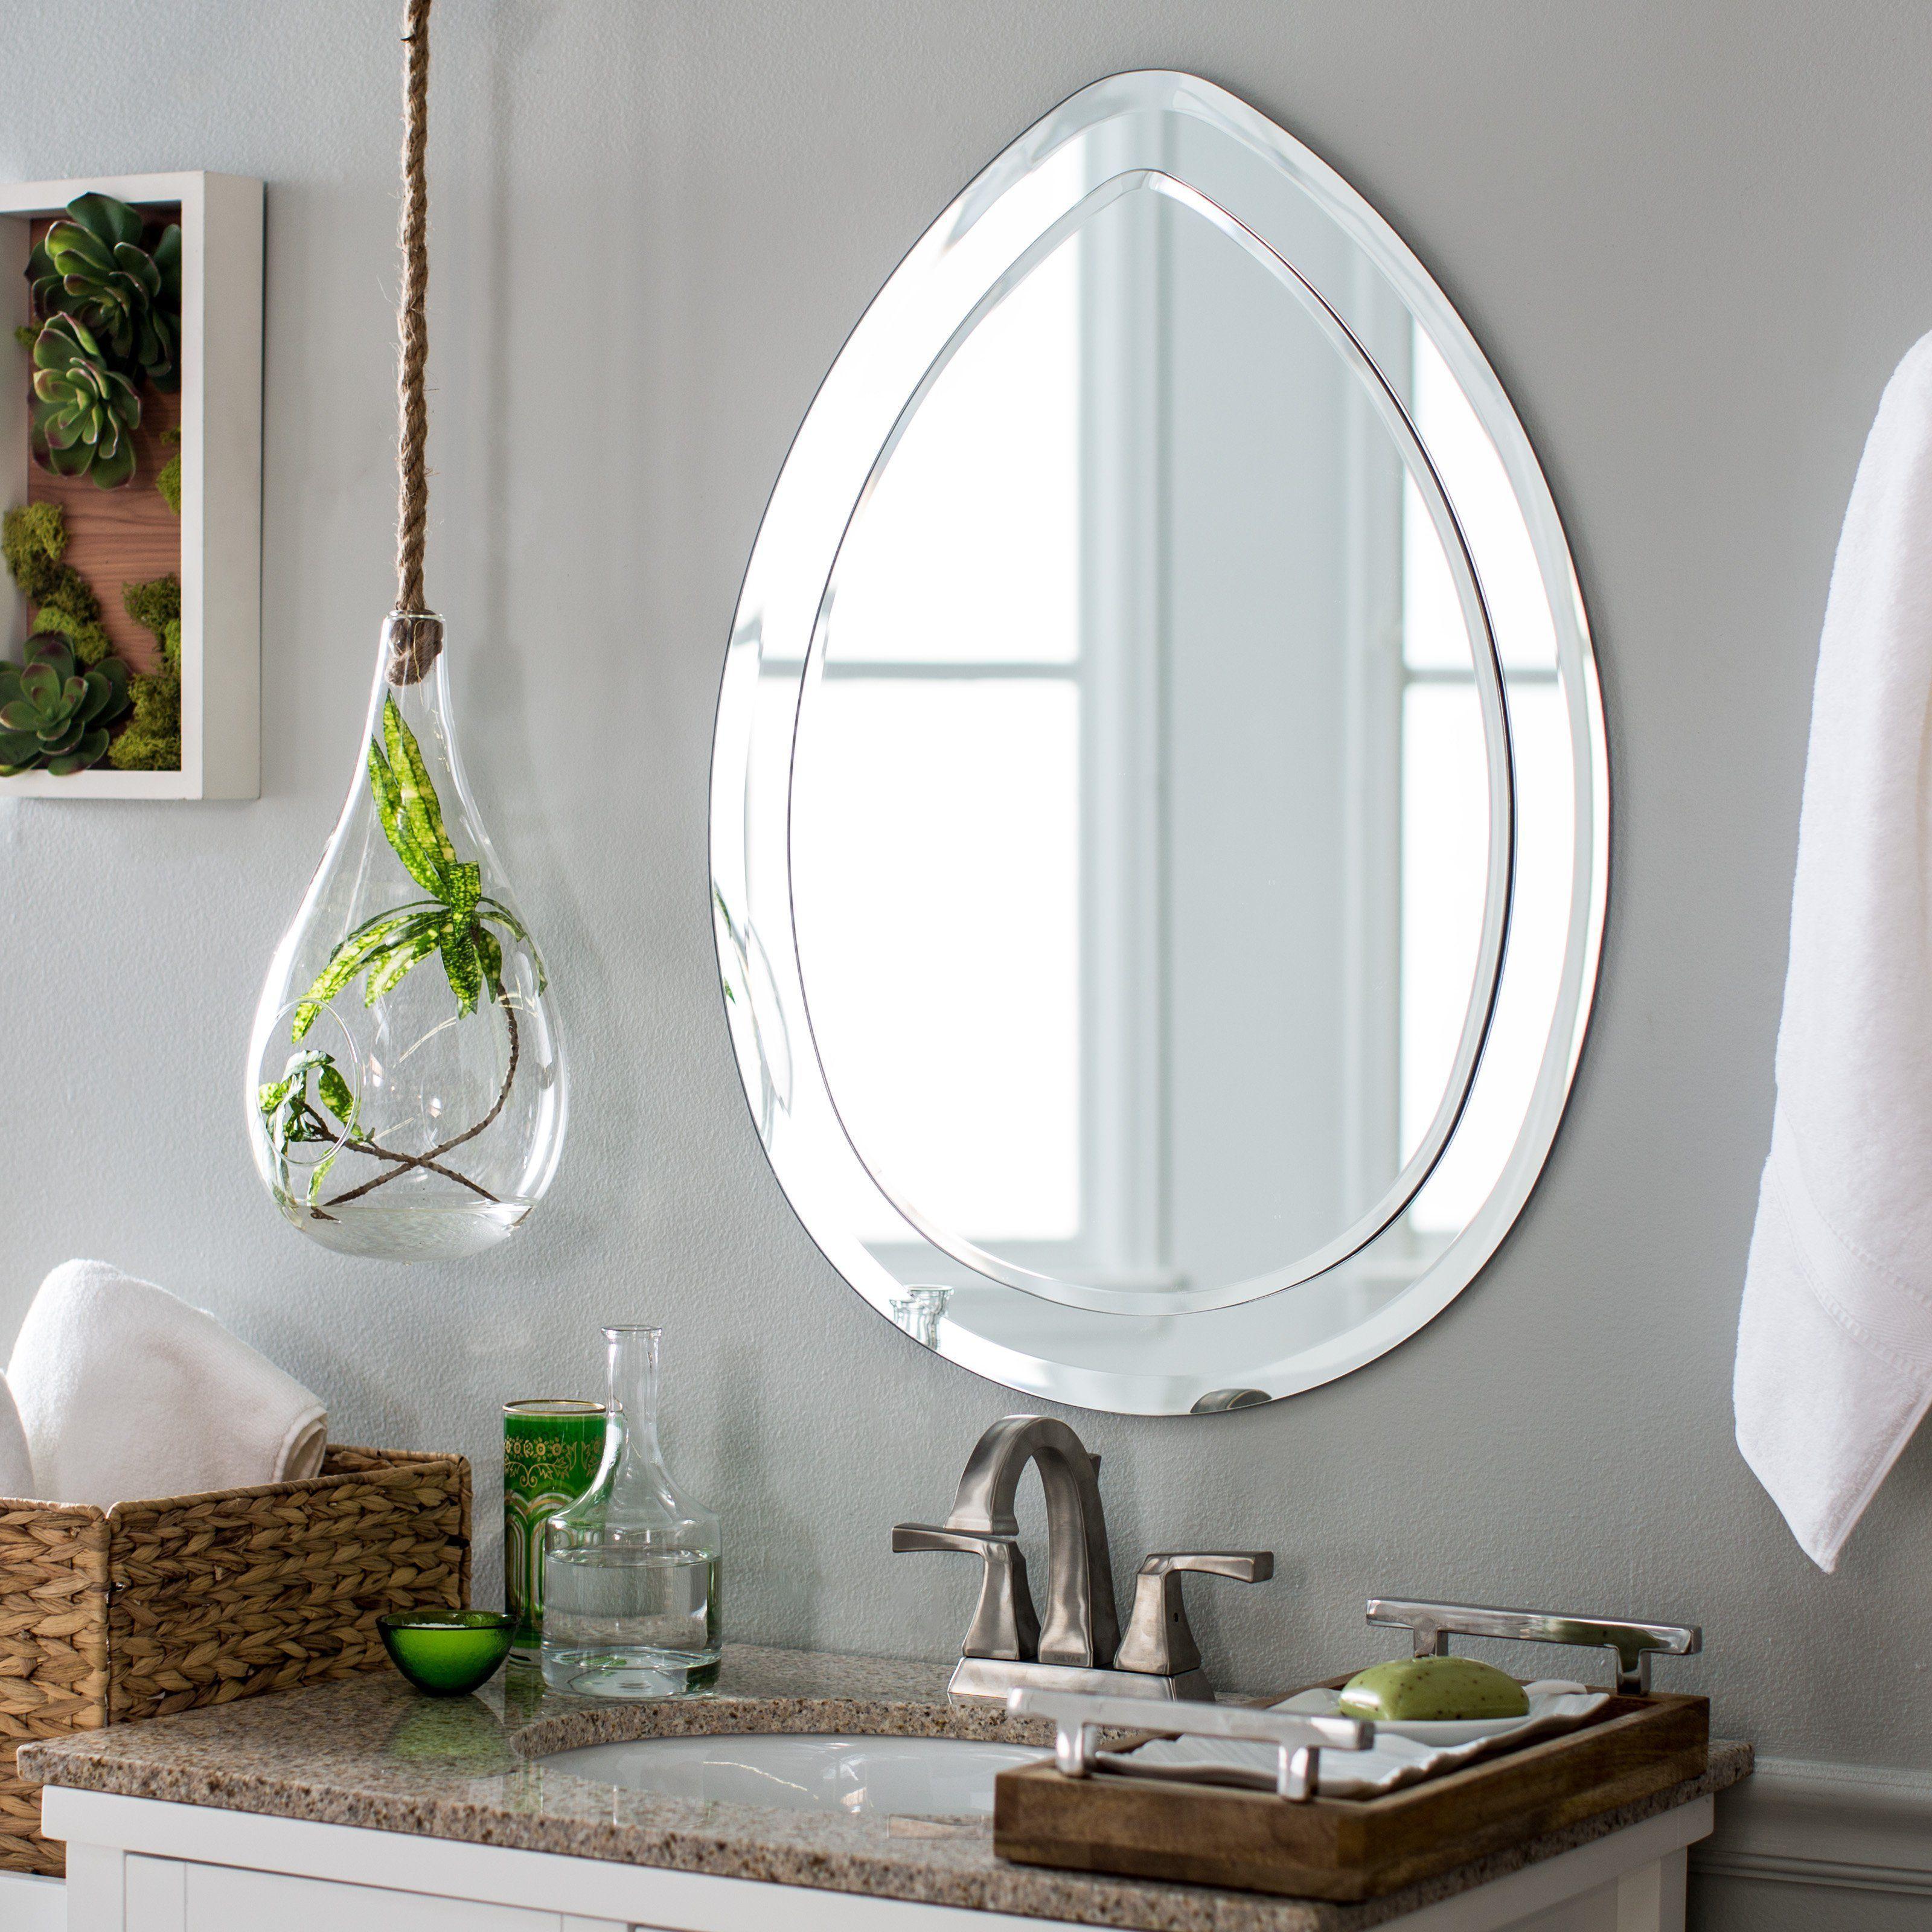 Decor Wonderland Droplet Modern Bathroom Mirror - 23W x 31H in ...